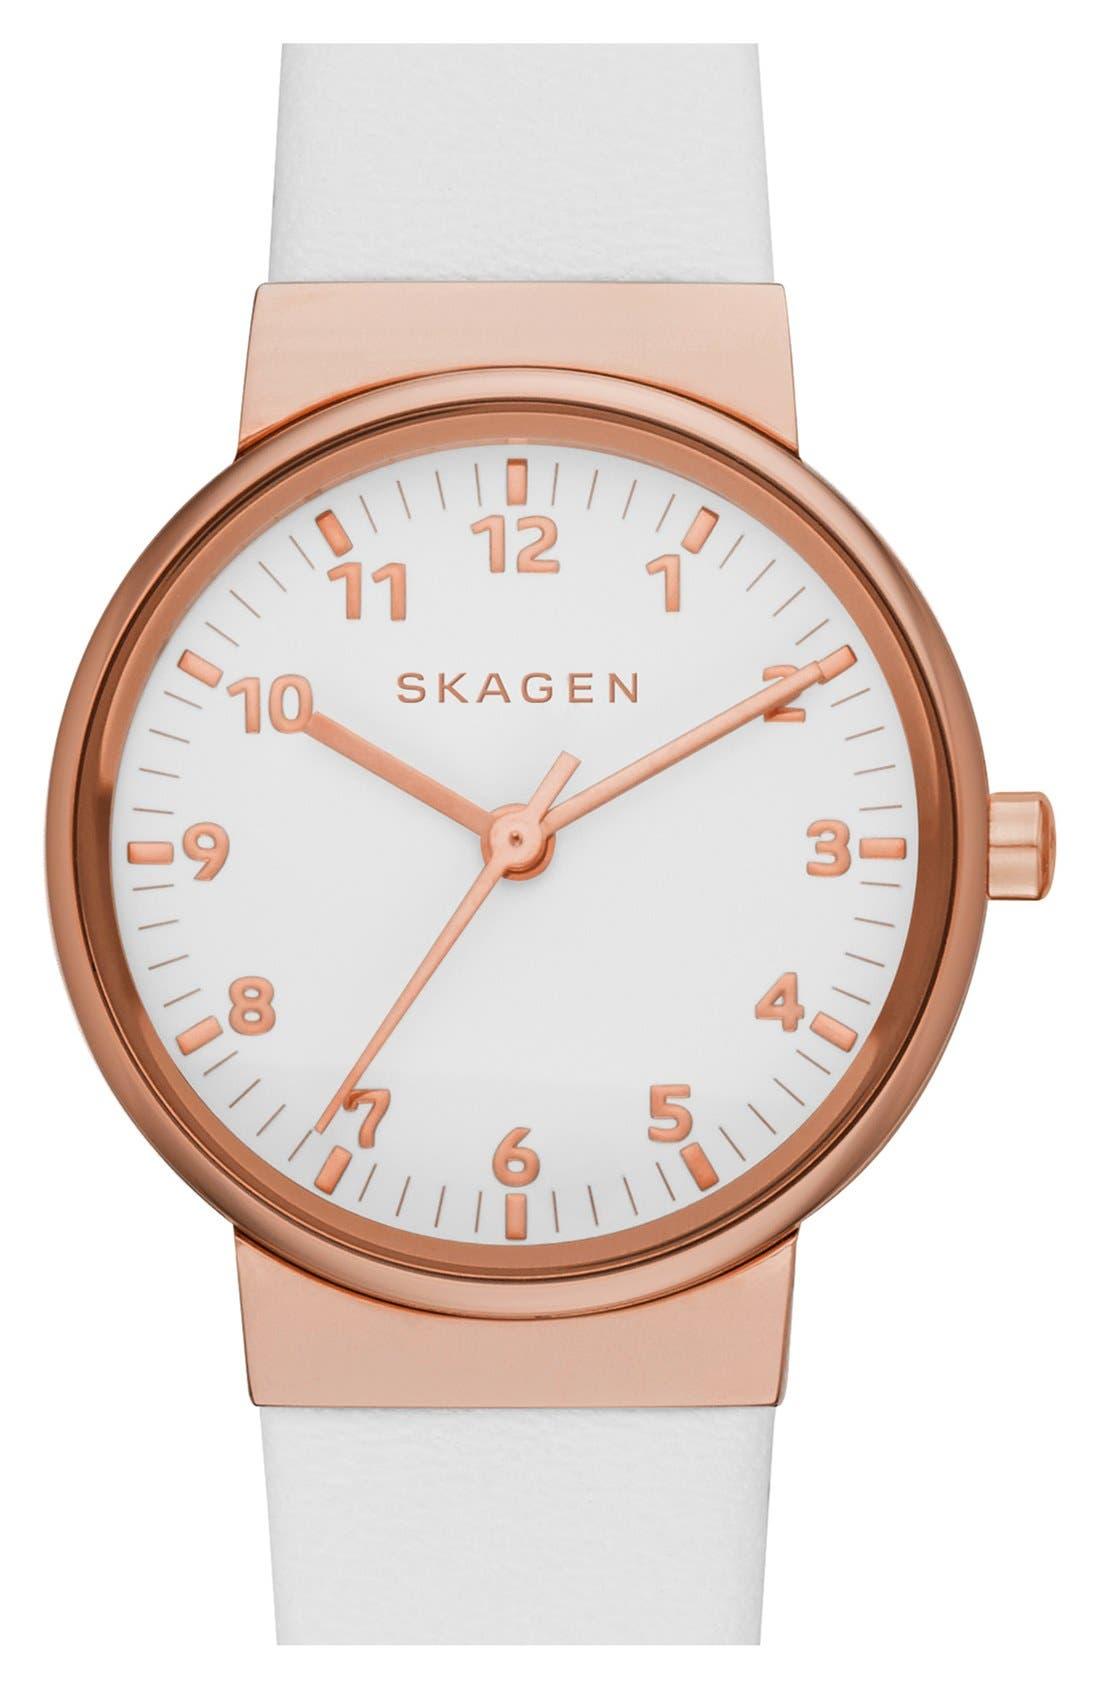 Main Image - Skagen 'Ancher' Leather Strap Watch, 26mm